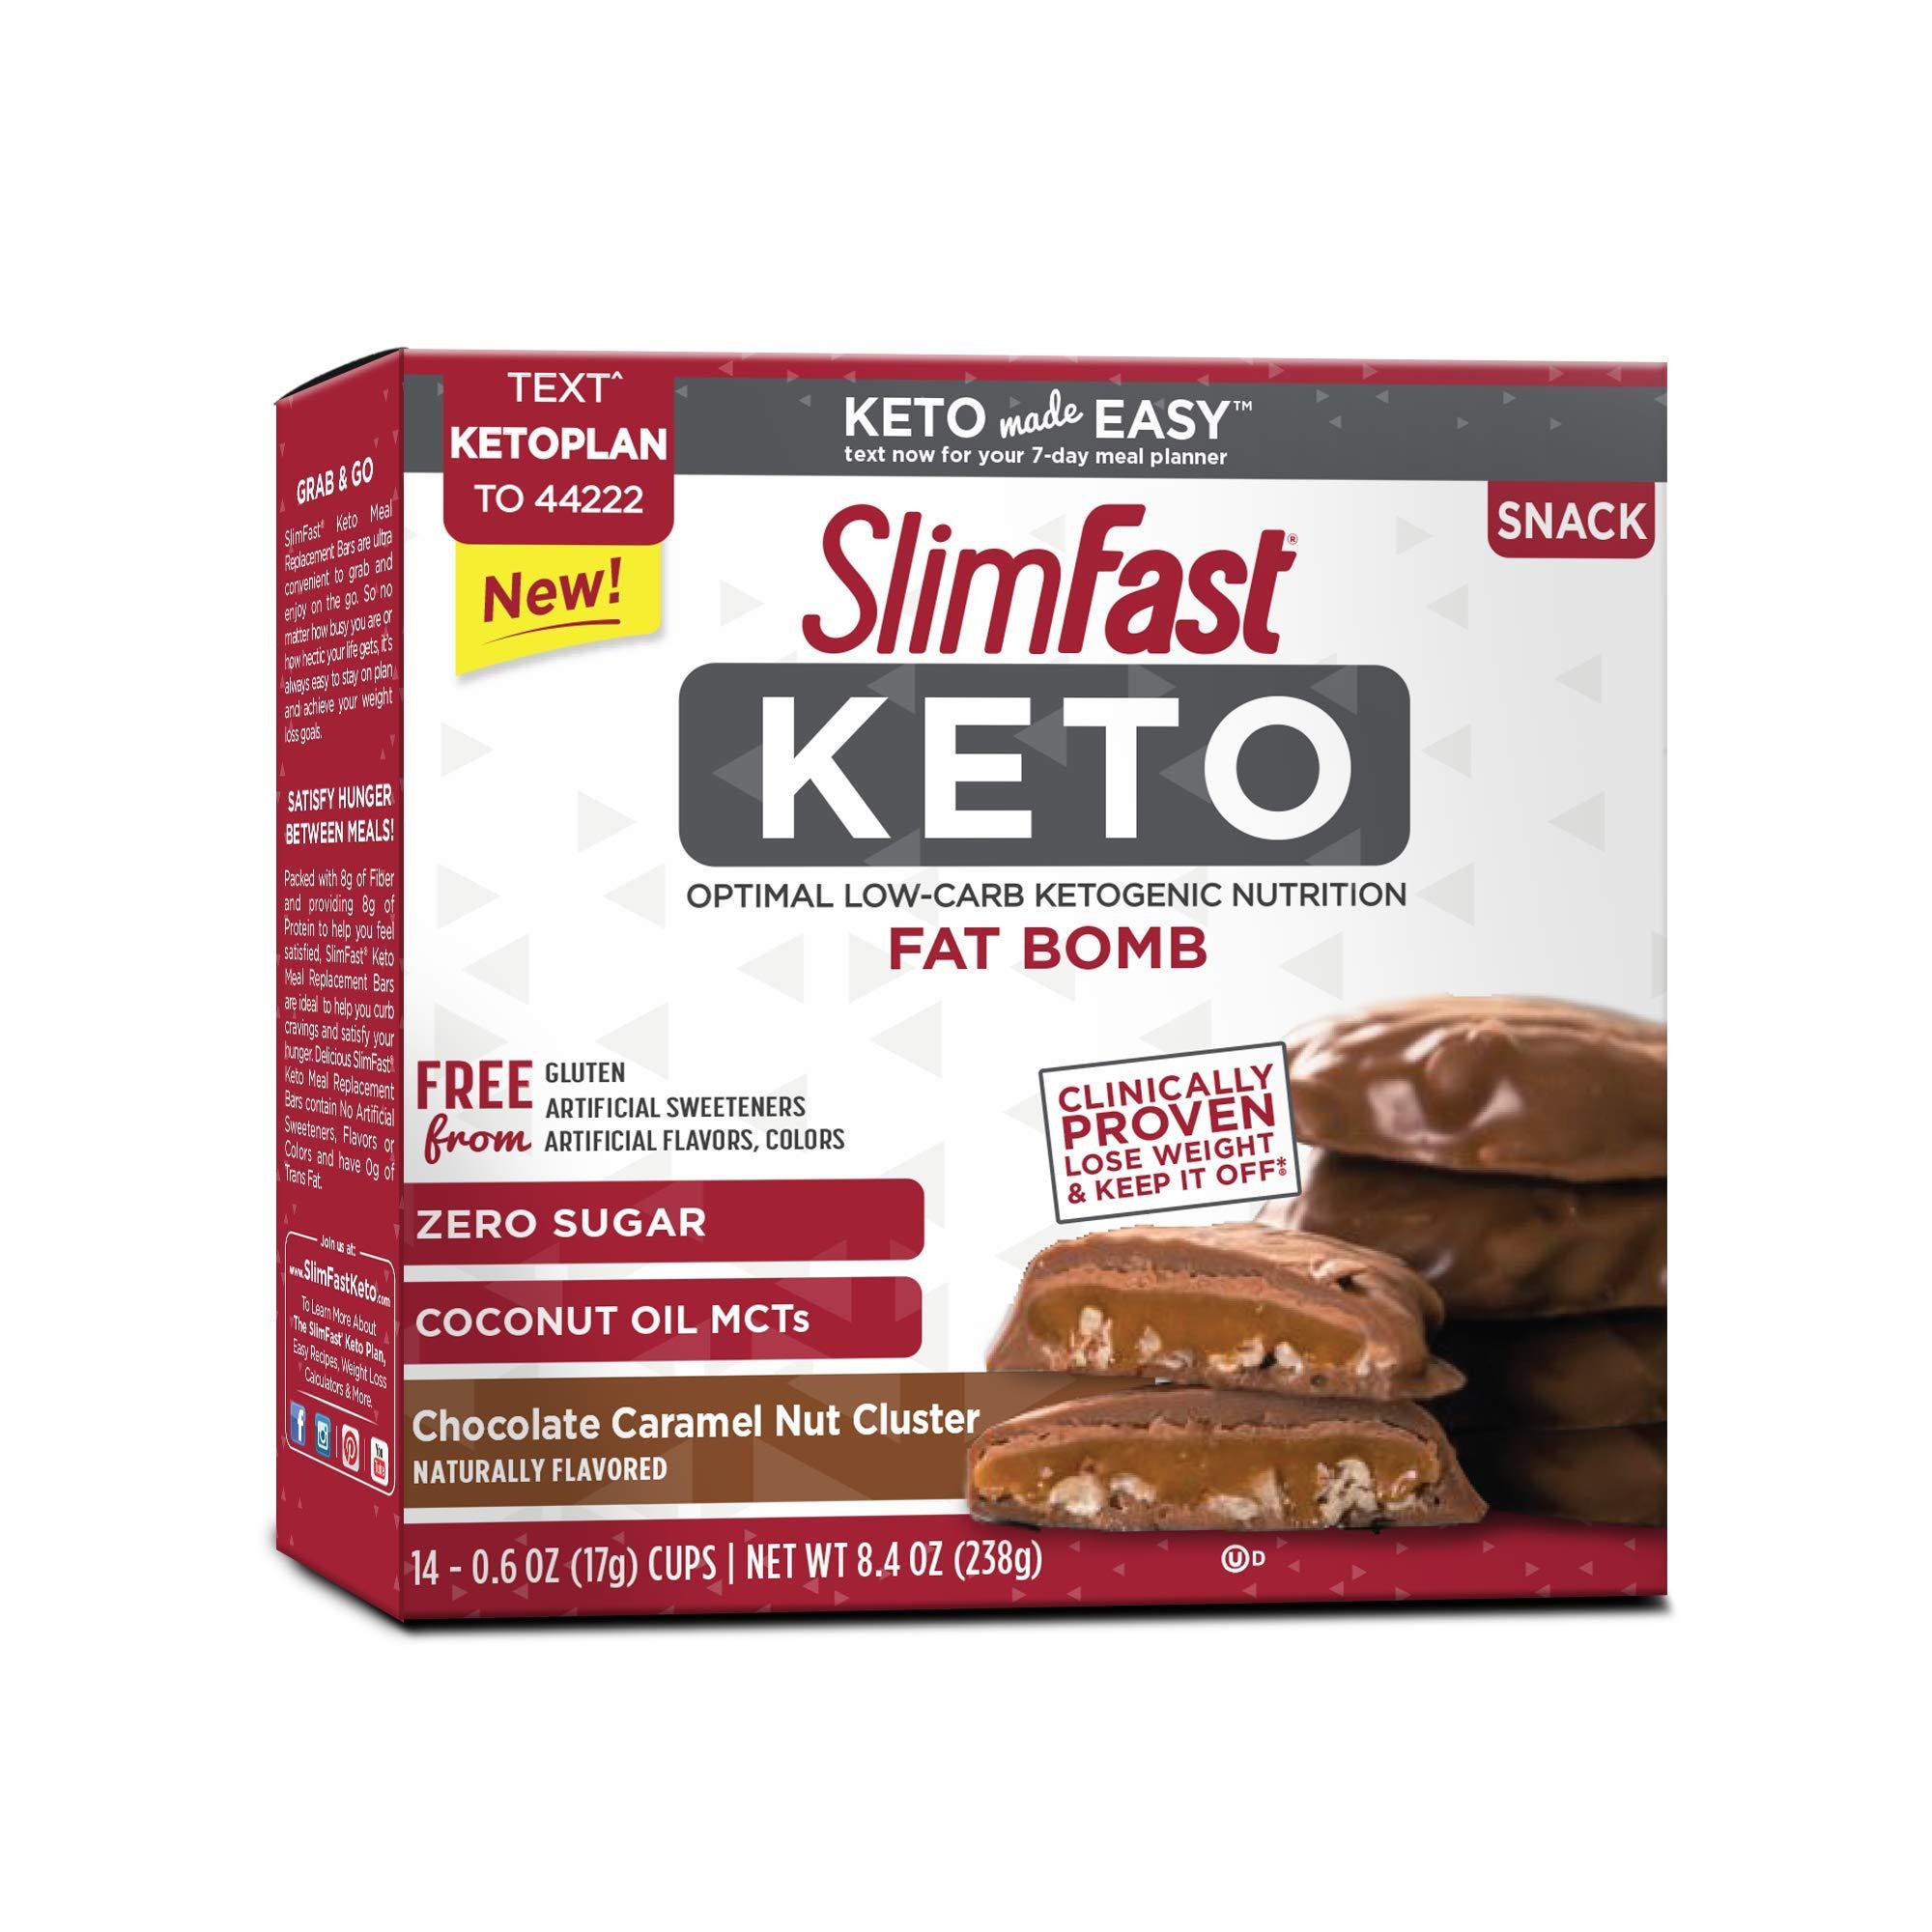 Slimfast Keto Fat Bomb Chocolate Caramel Nut Cluster 0.59 ounce, 14 per box (4 Boxes) by Slimfast Keto